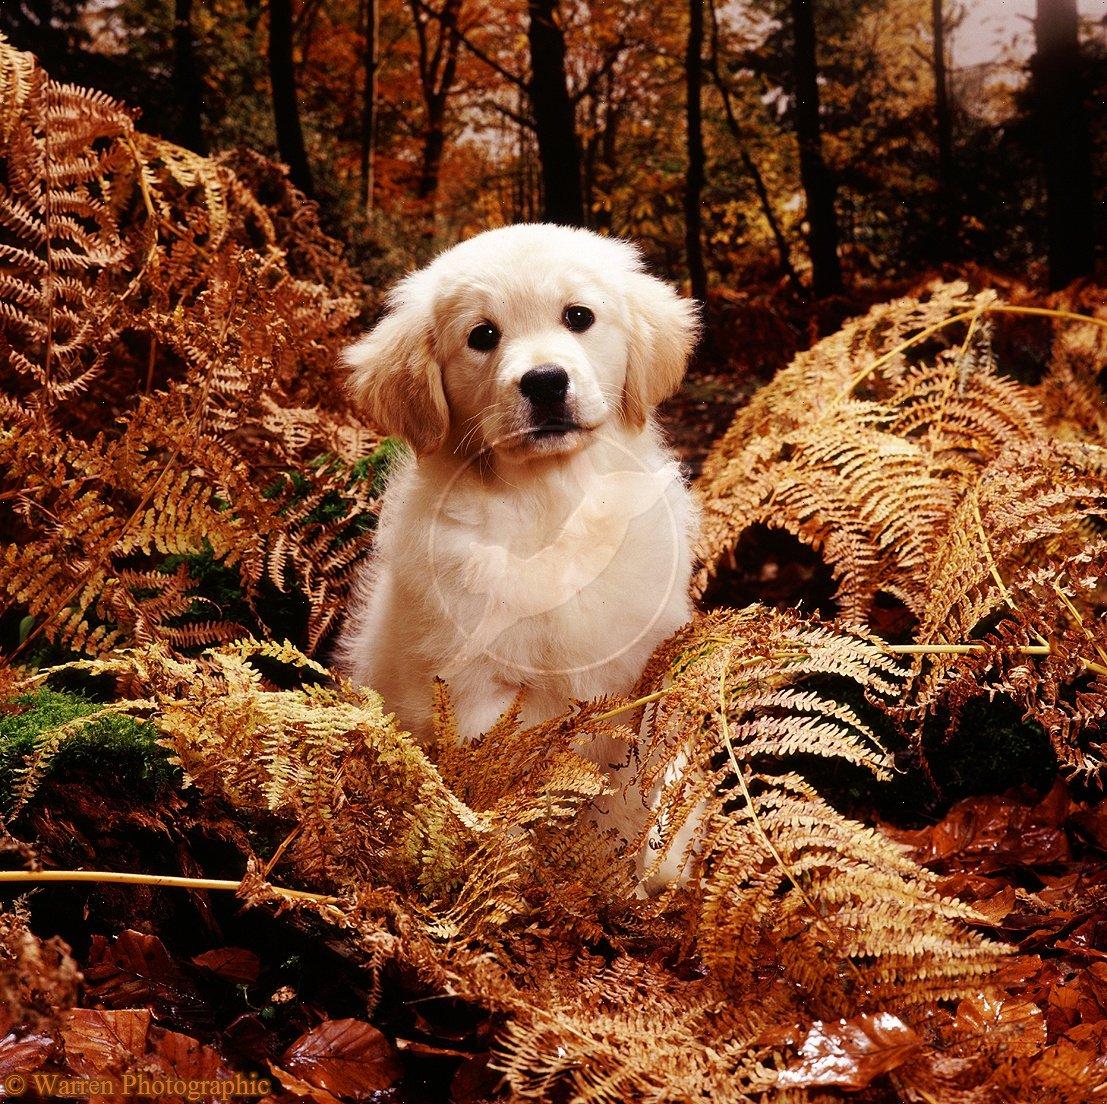 Fall Puppy Wallpaper Golden Retriever Puppy Lala In Autumn Woods Source Of